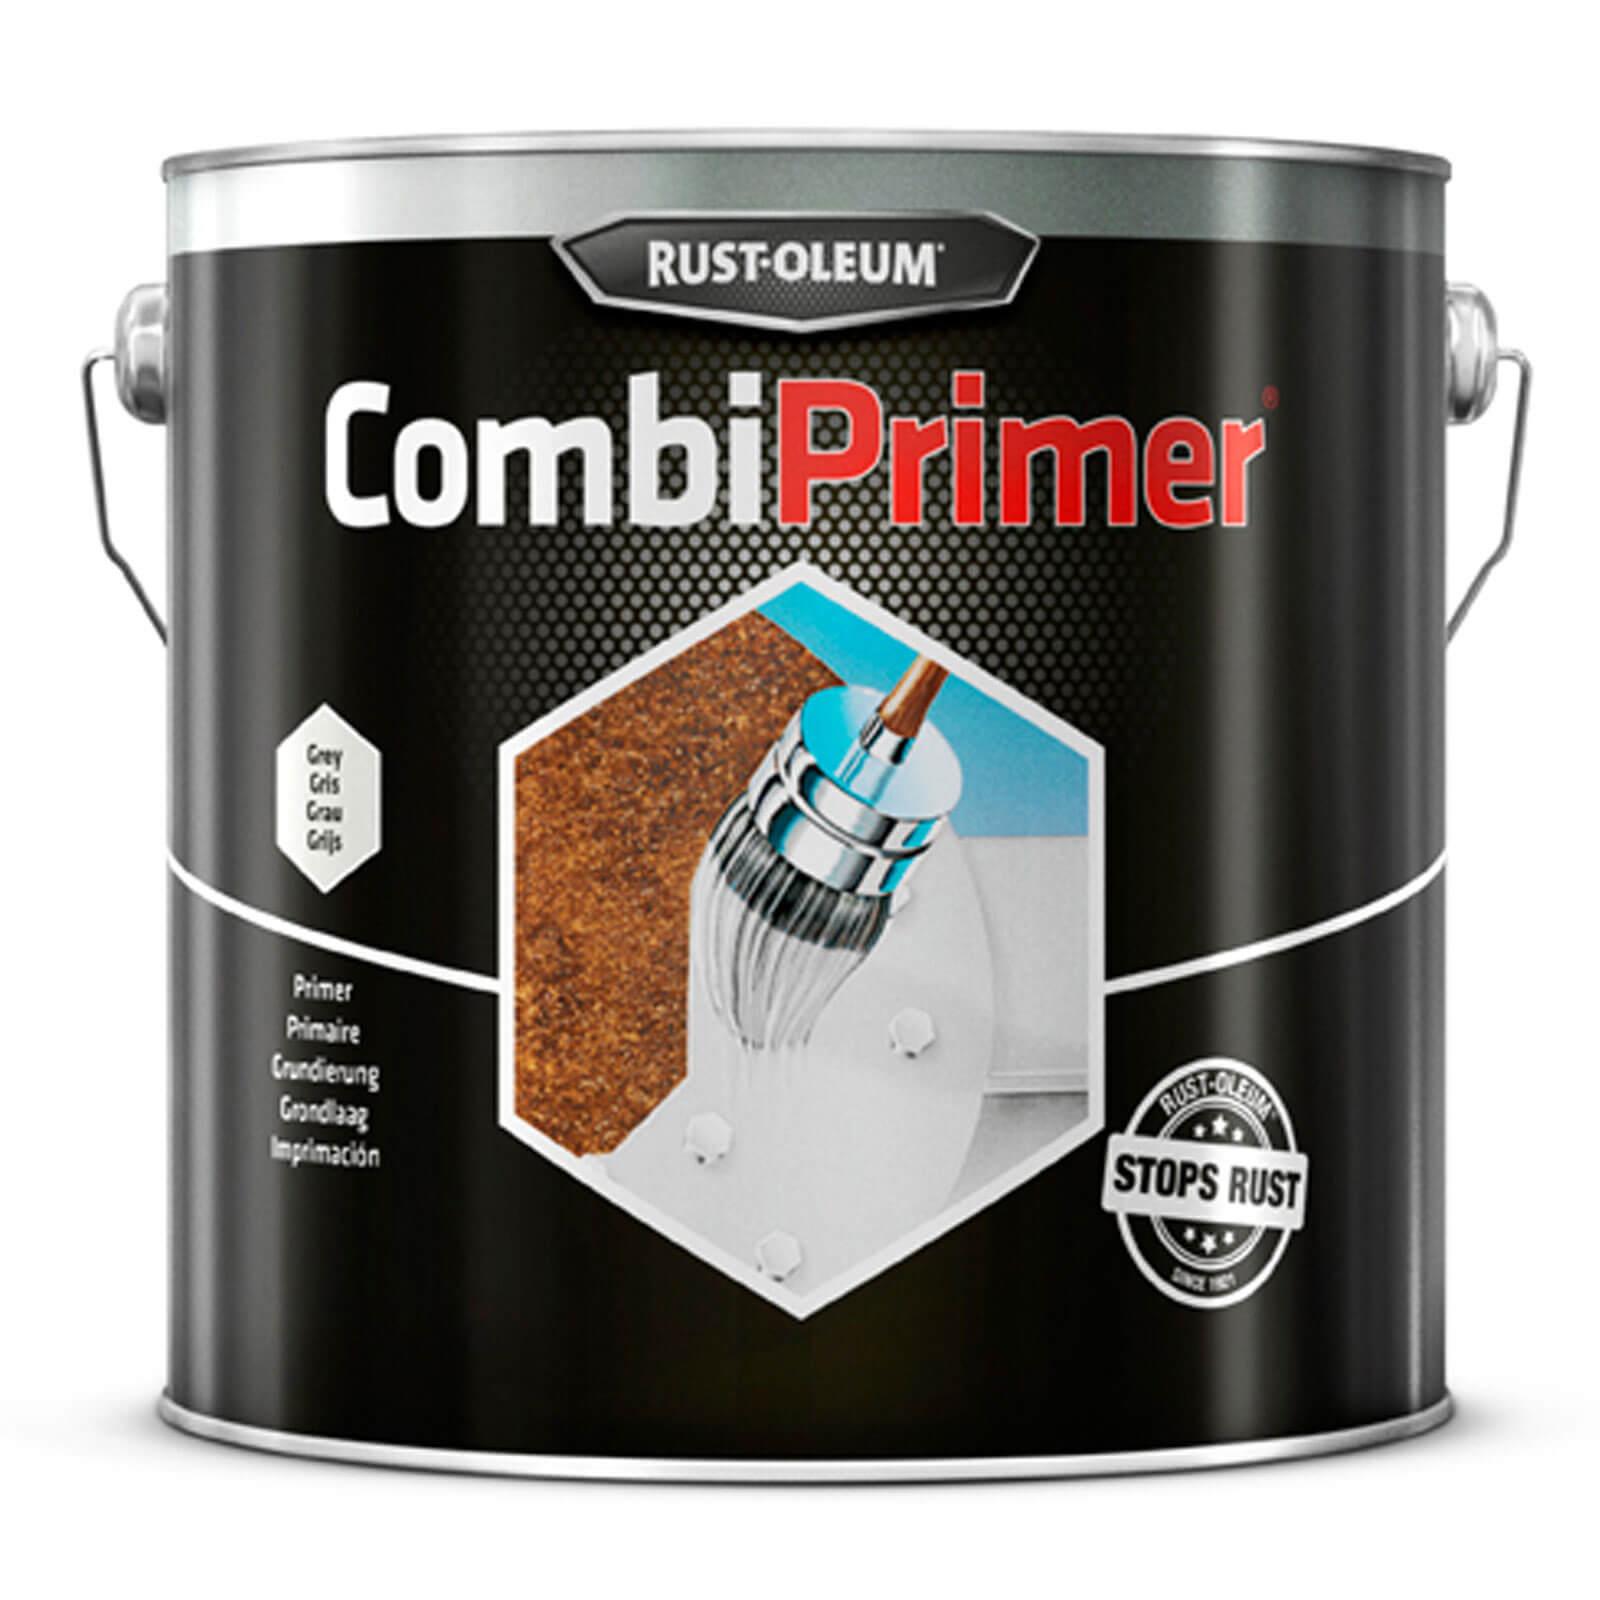 Rust Oleum CombiPrimer Anti Rust Metal Primer Paint Grey 2.5l